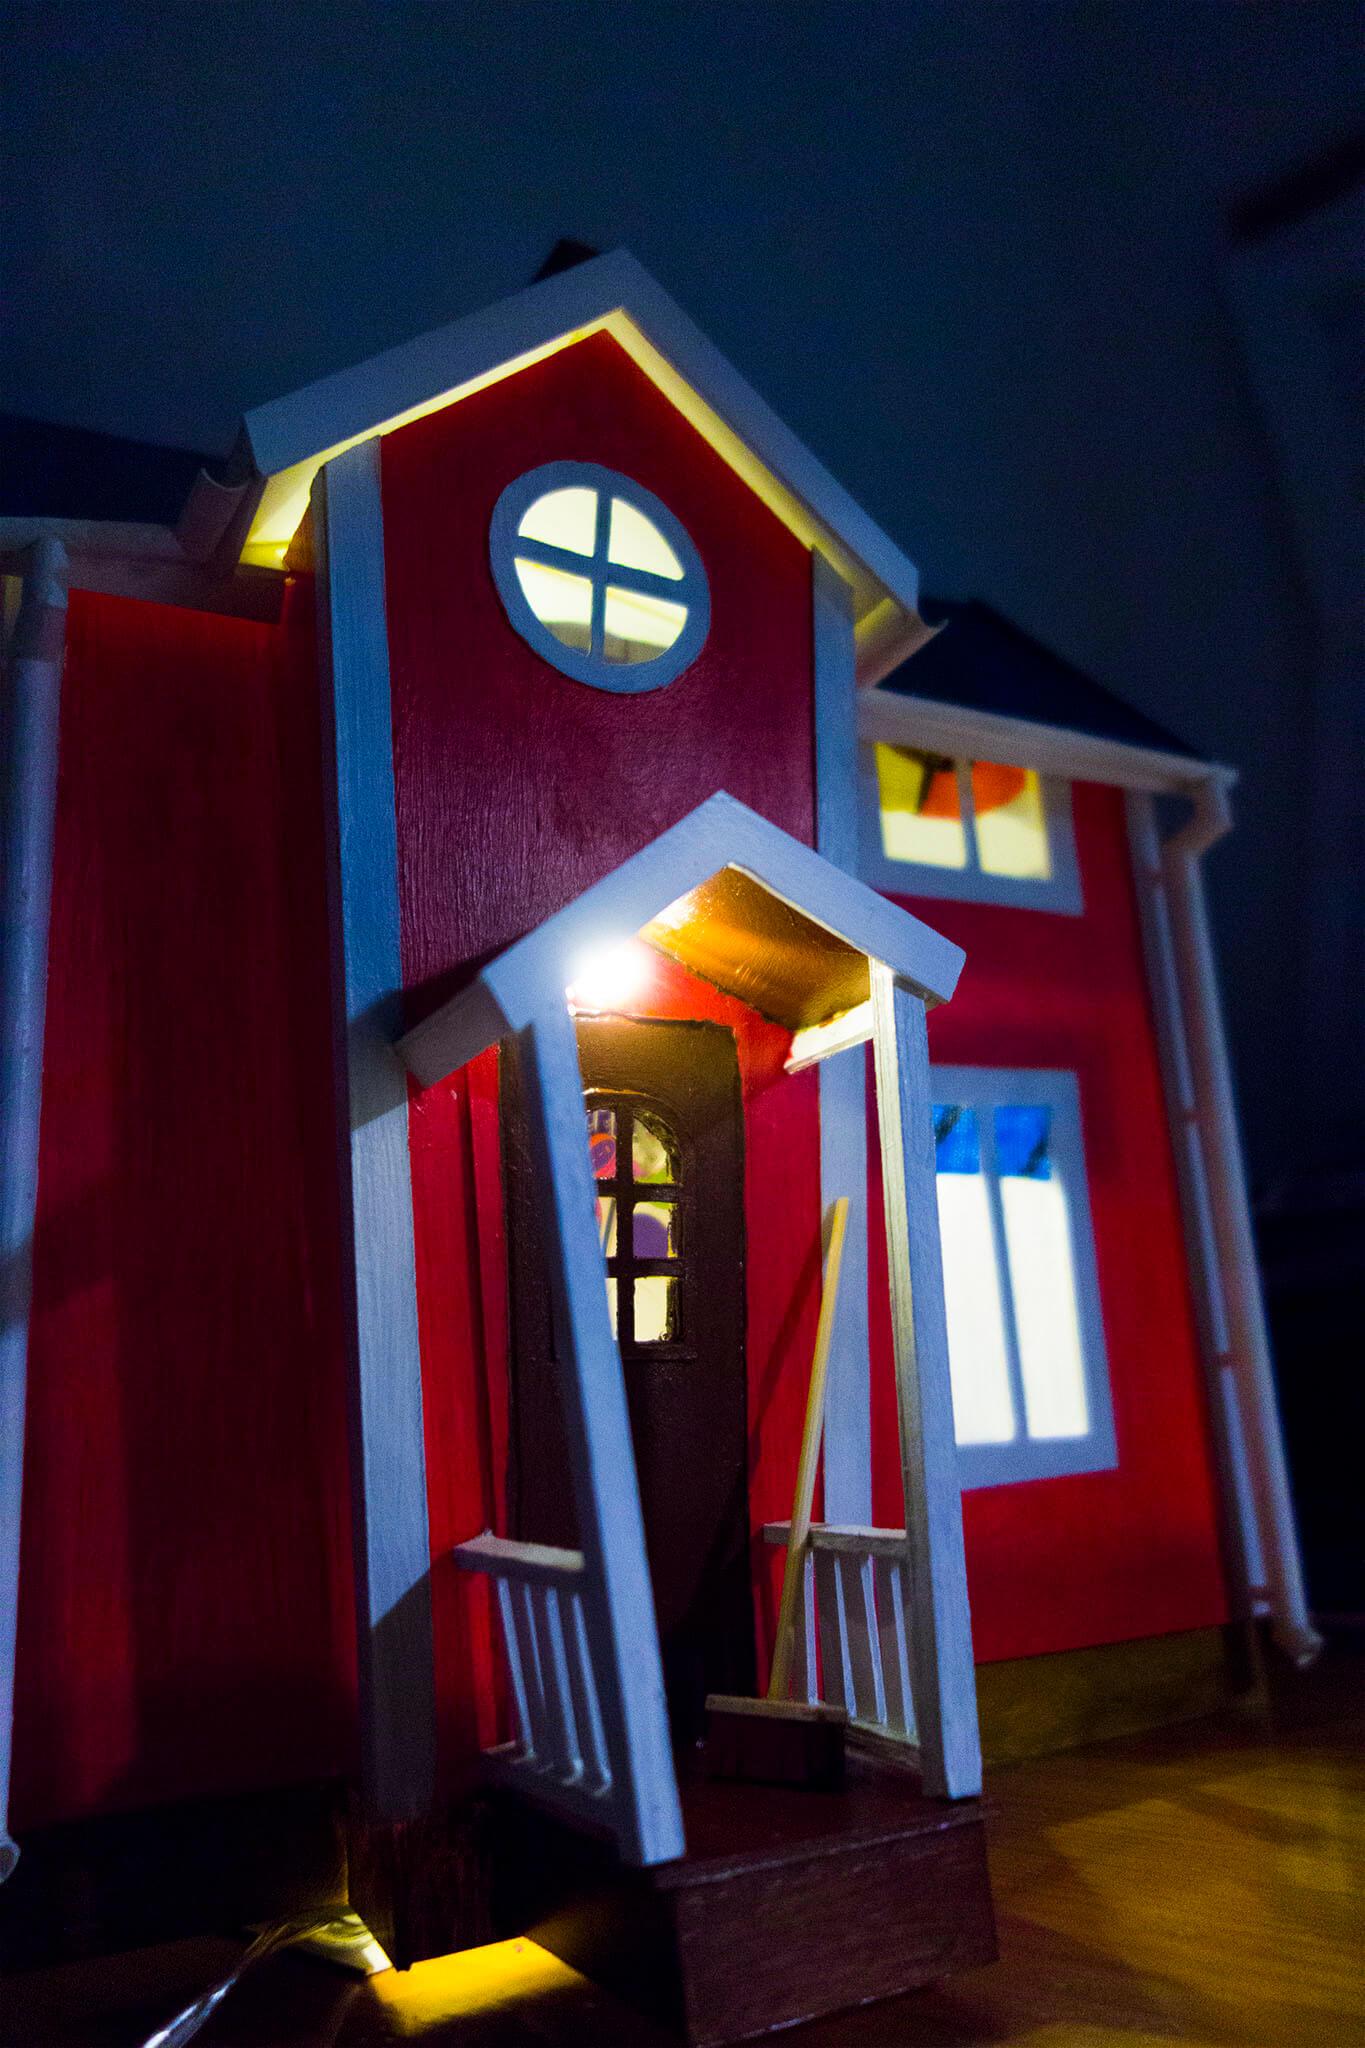 Building pikku's house